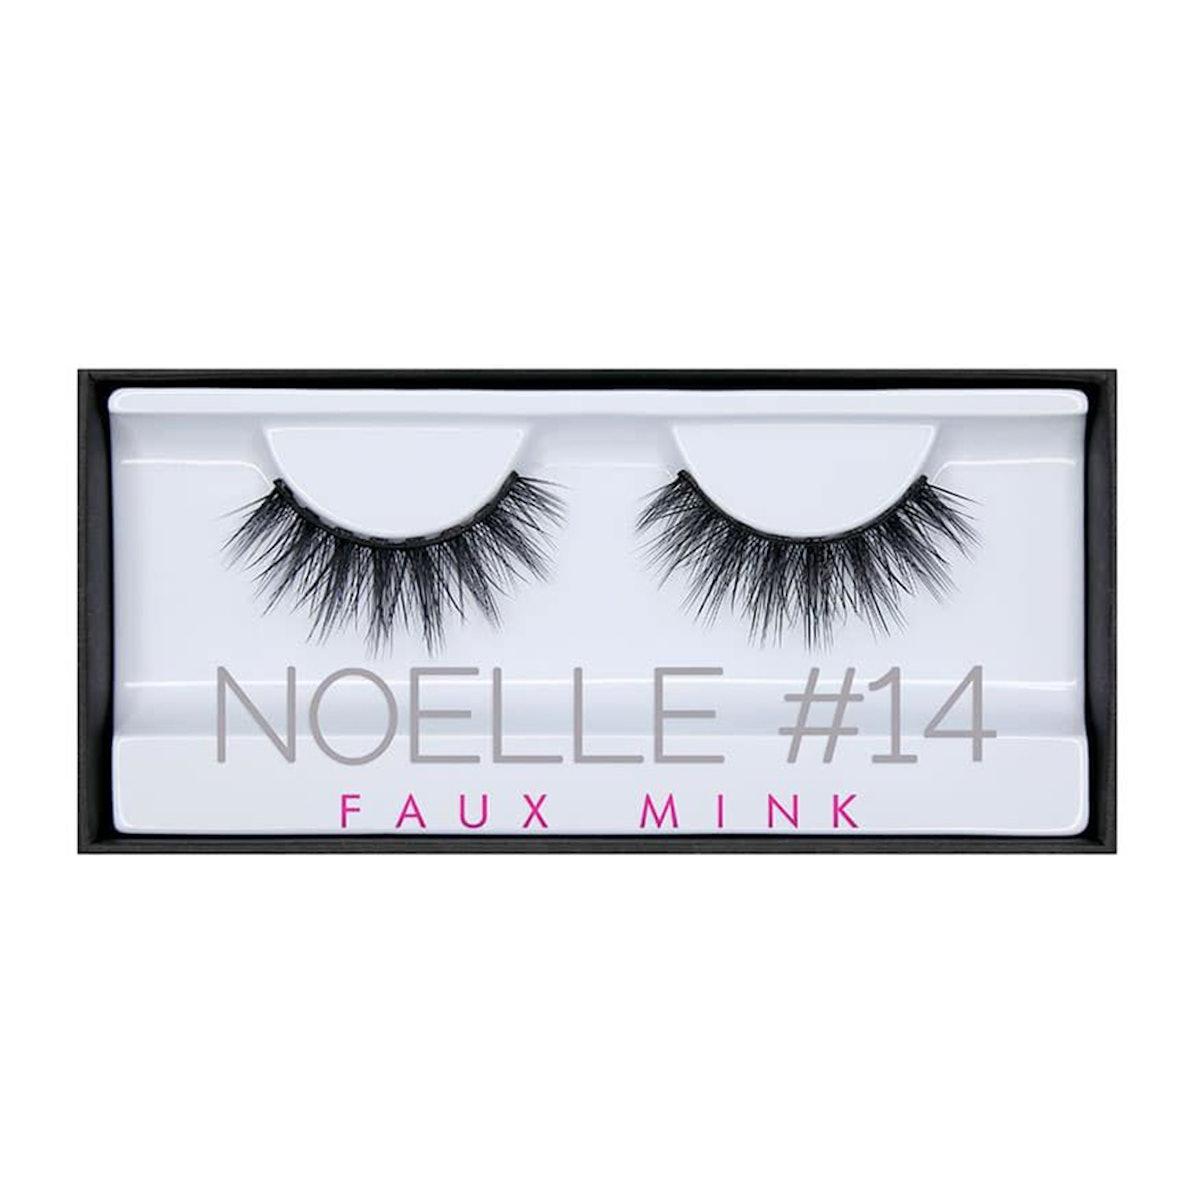 "Faux Mink Lashes in style ""Noelle #14"""